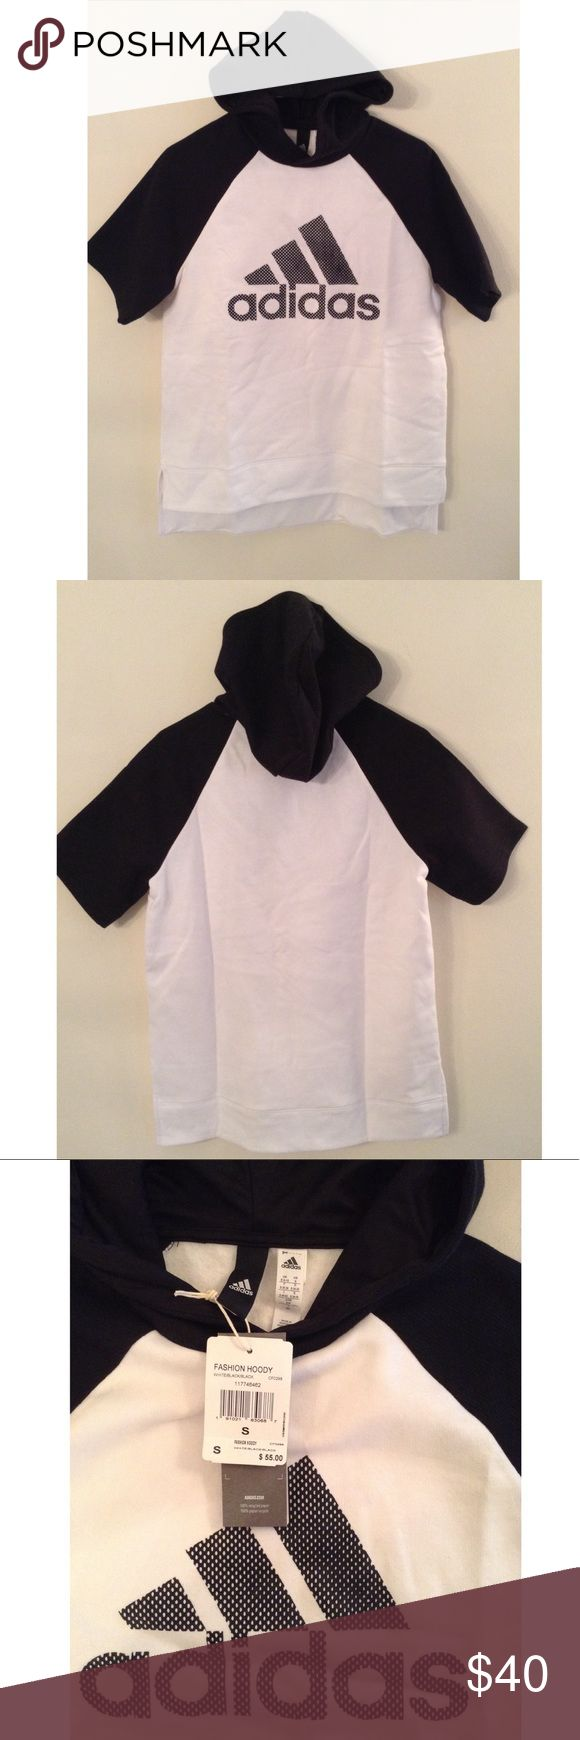 Adidas Black and White Hoody Selling a NWT women's Adidas black and white hoody in size small. adidas Tops Sweatshirts & Hoodies